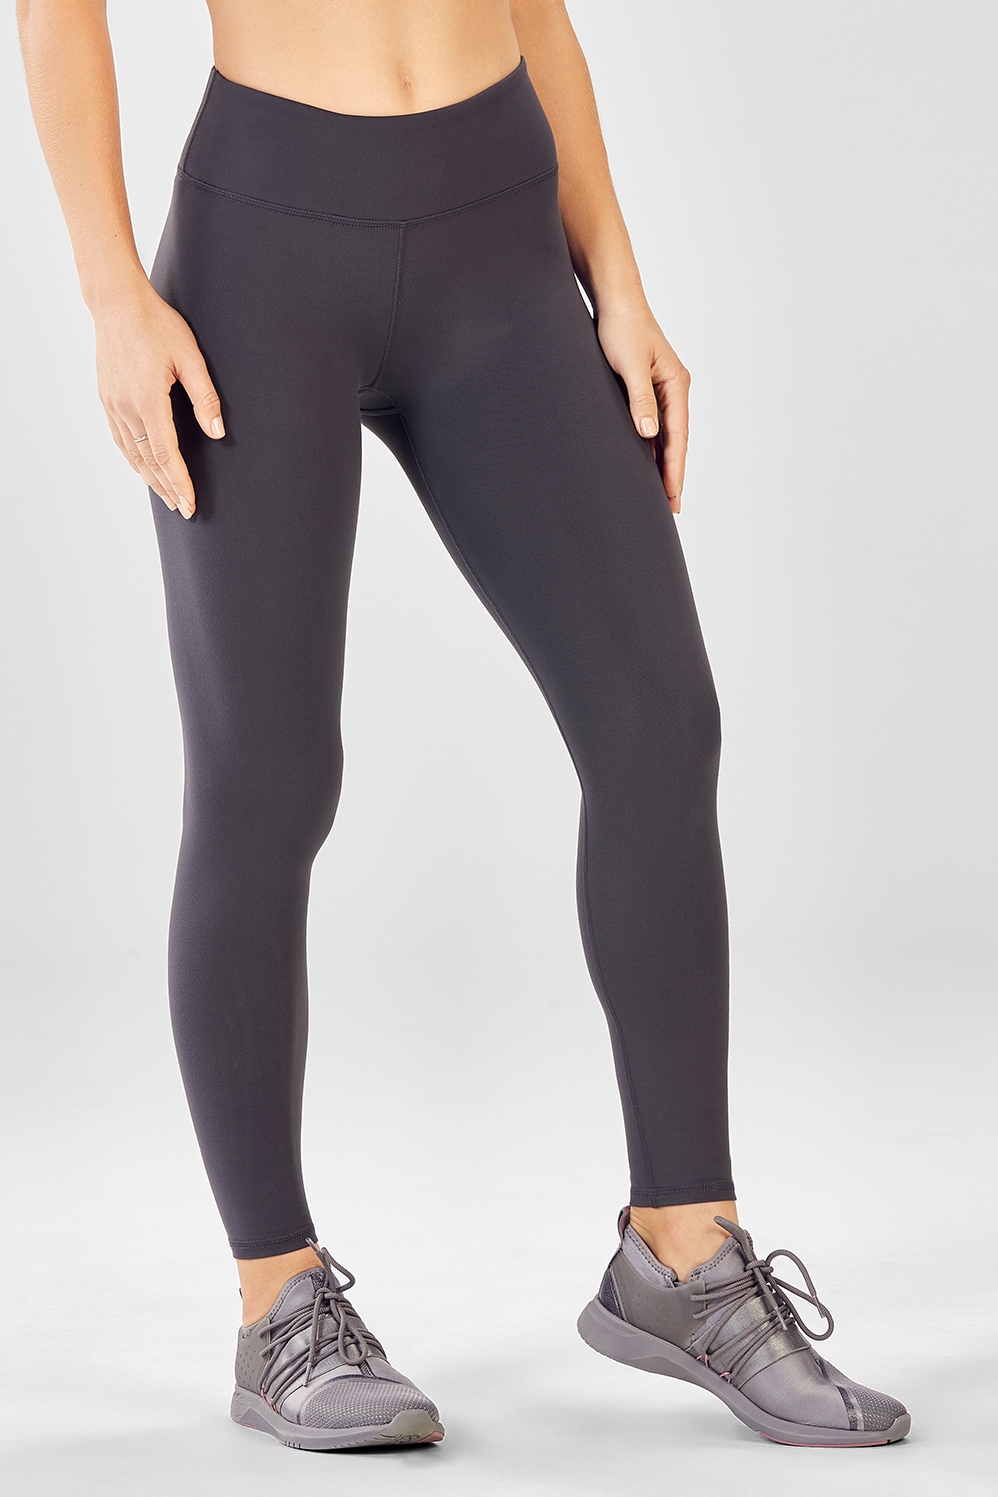 f85a3e3bf441bf Salar Solid PowerHold® Legging - Fabletics